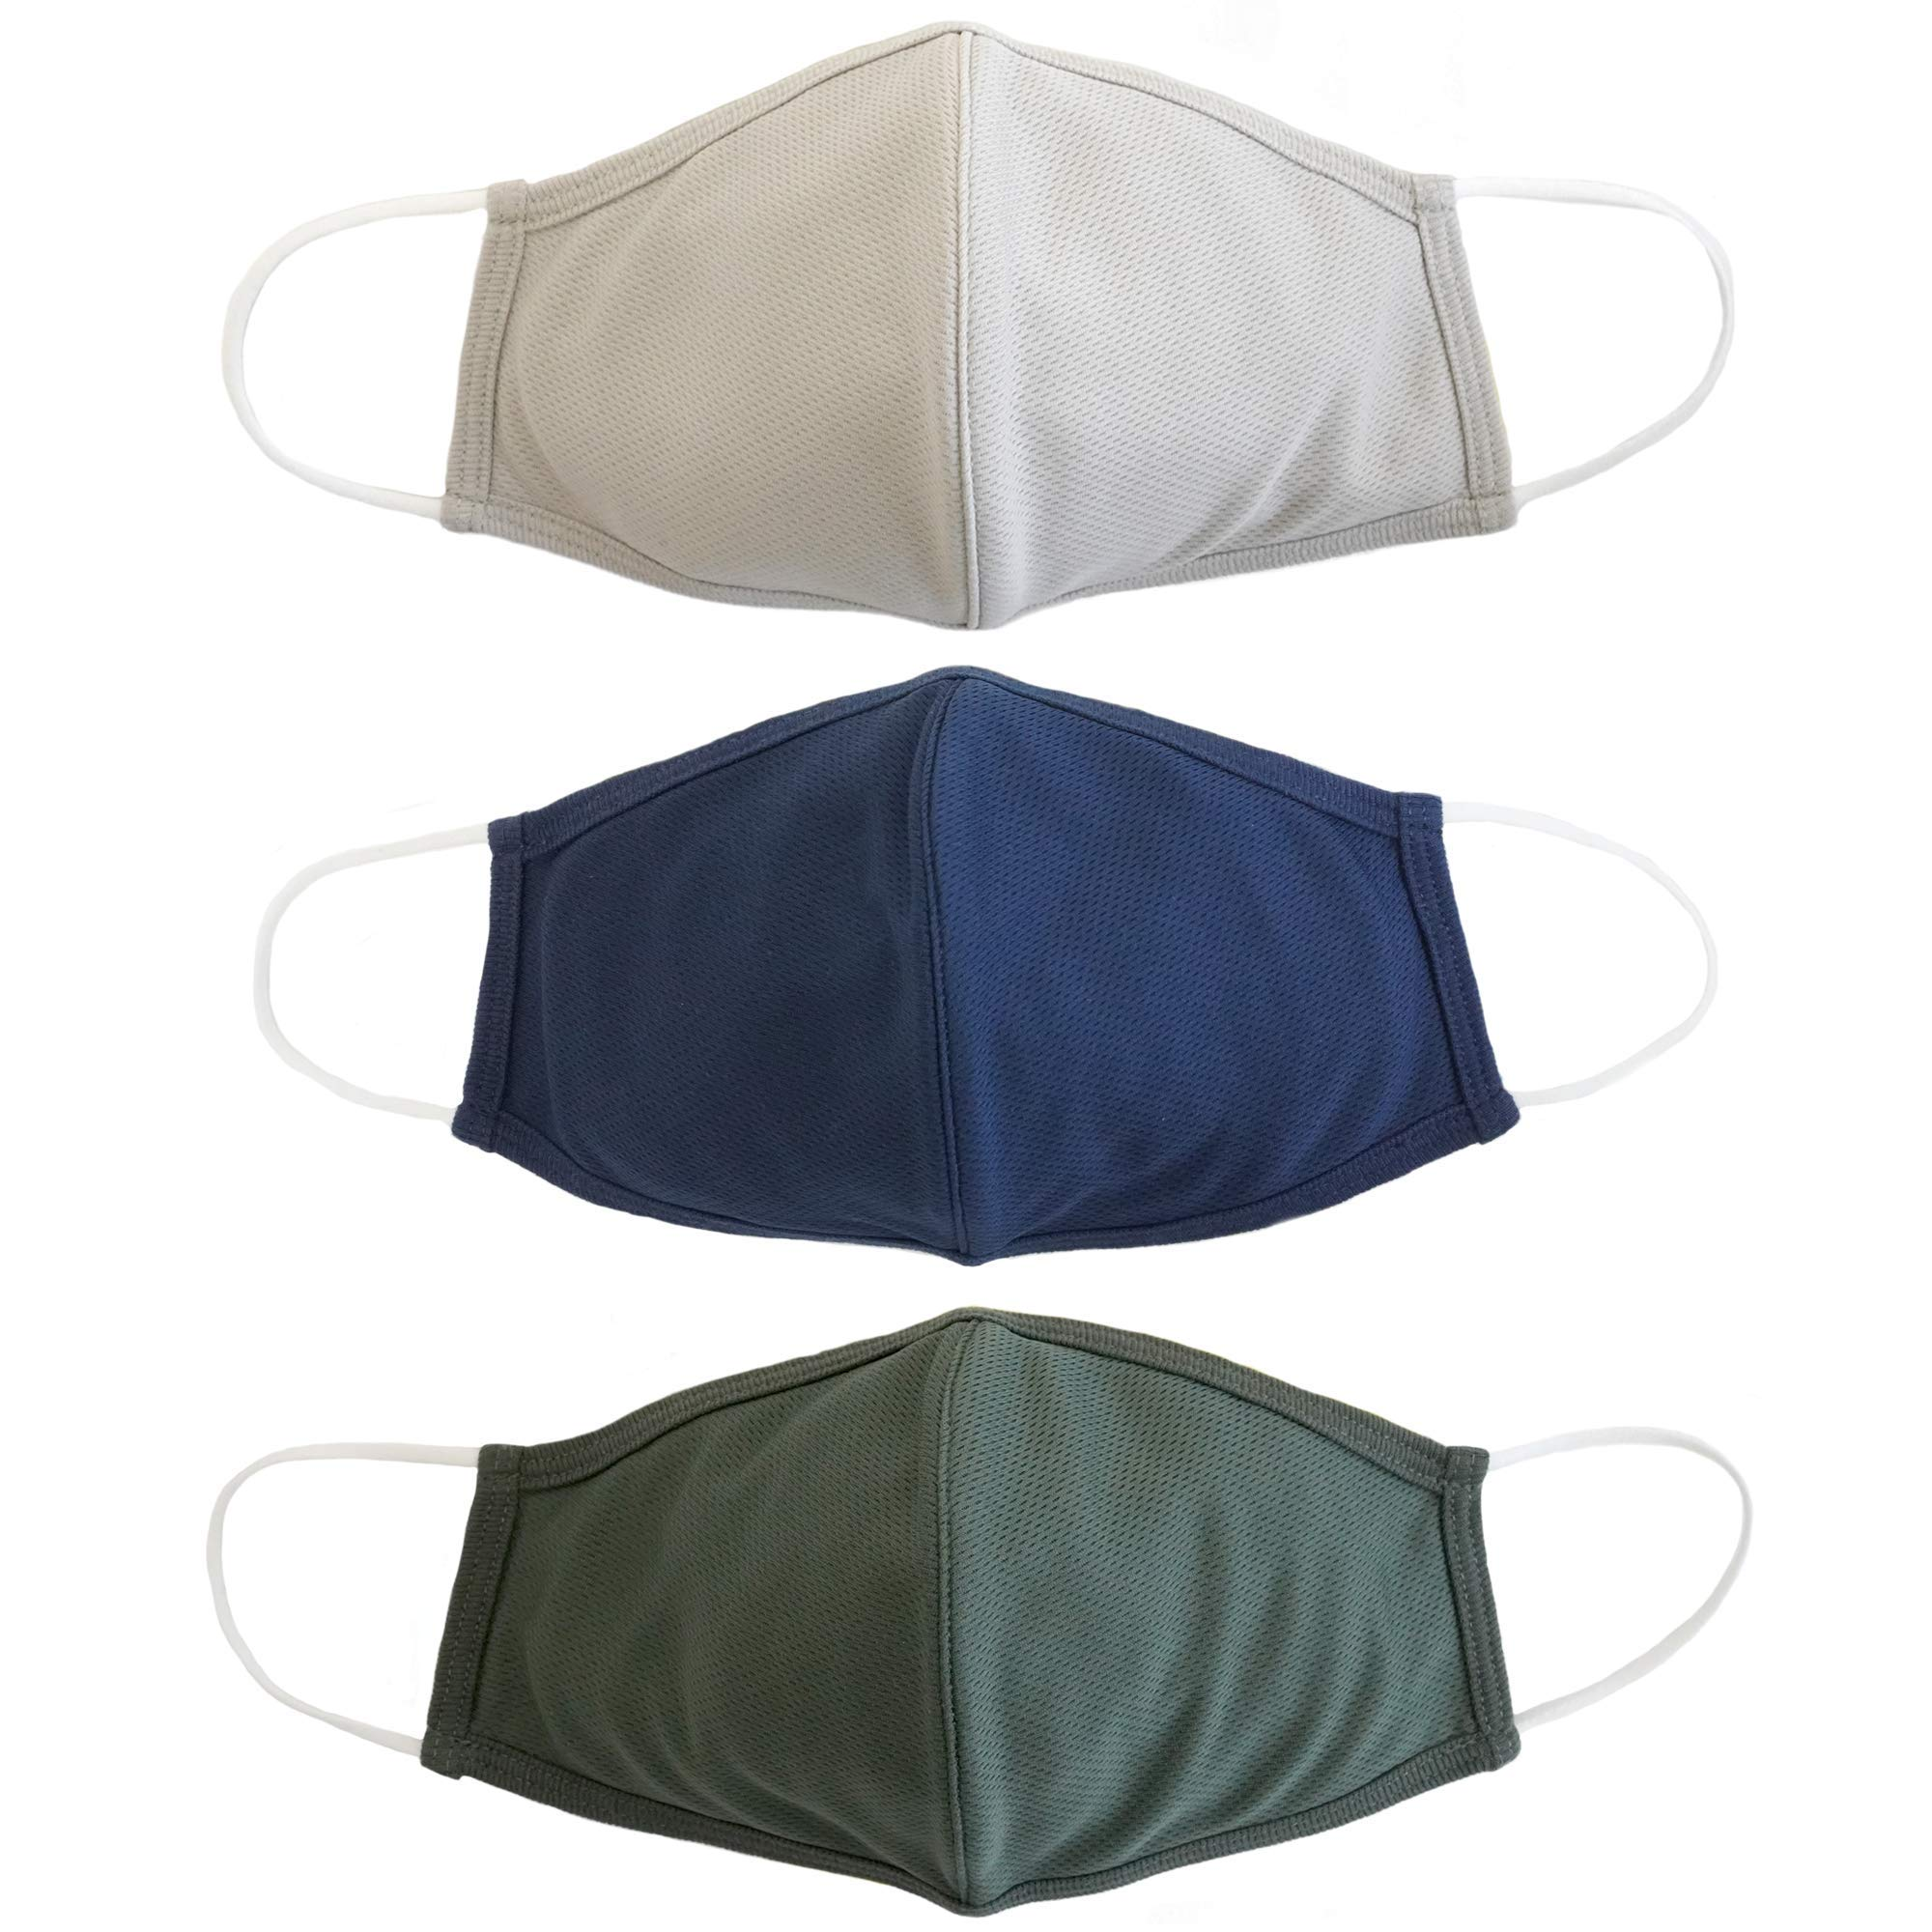 EnerPlex Kids 3-Ply Face Cloth Mask - Comfortable Breathable Safety Mask, Machine Washable Masks, Reusable Masks for Children ages 3-9 Kids (3-Pack) - Cool Naturals